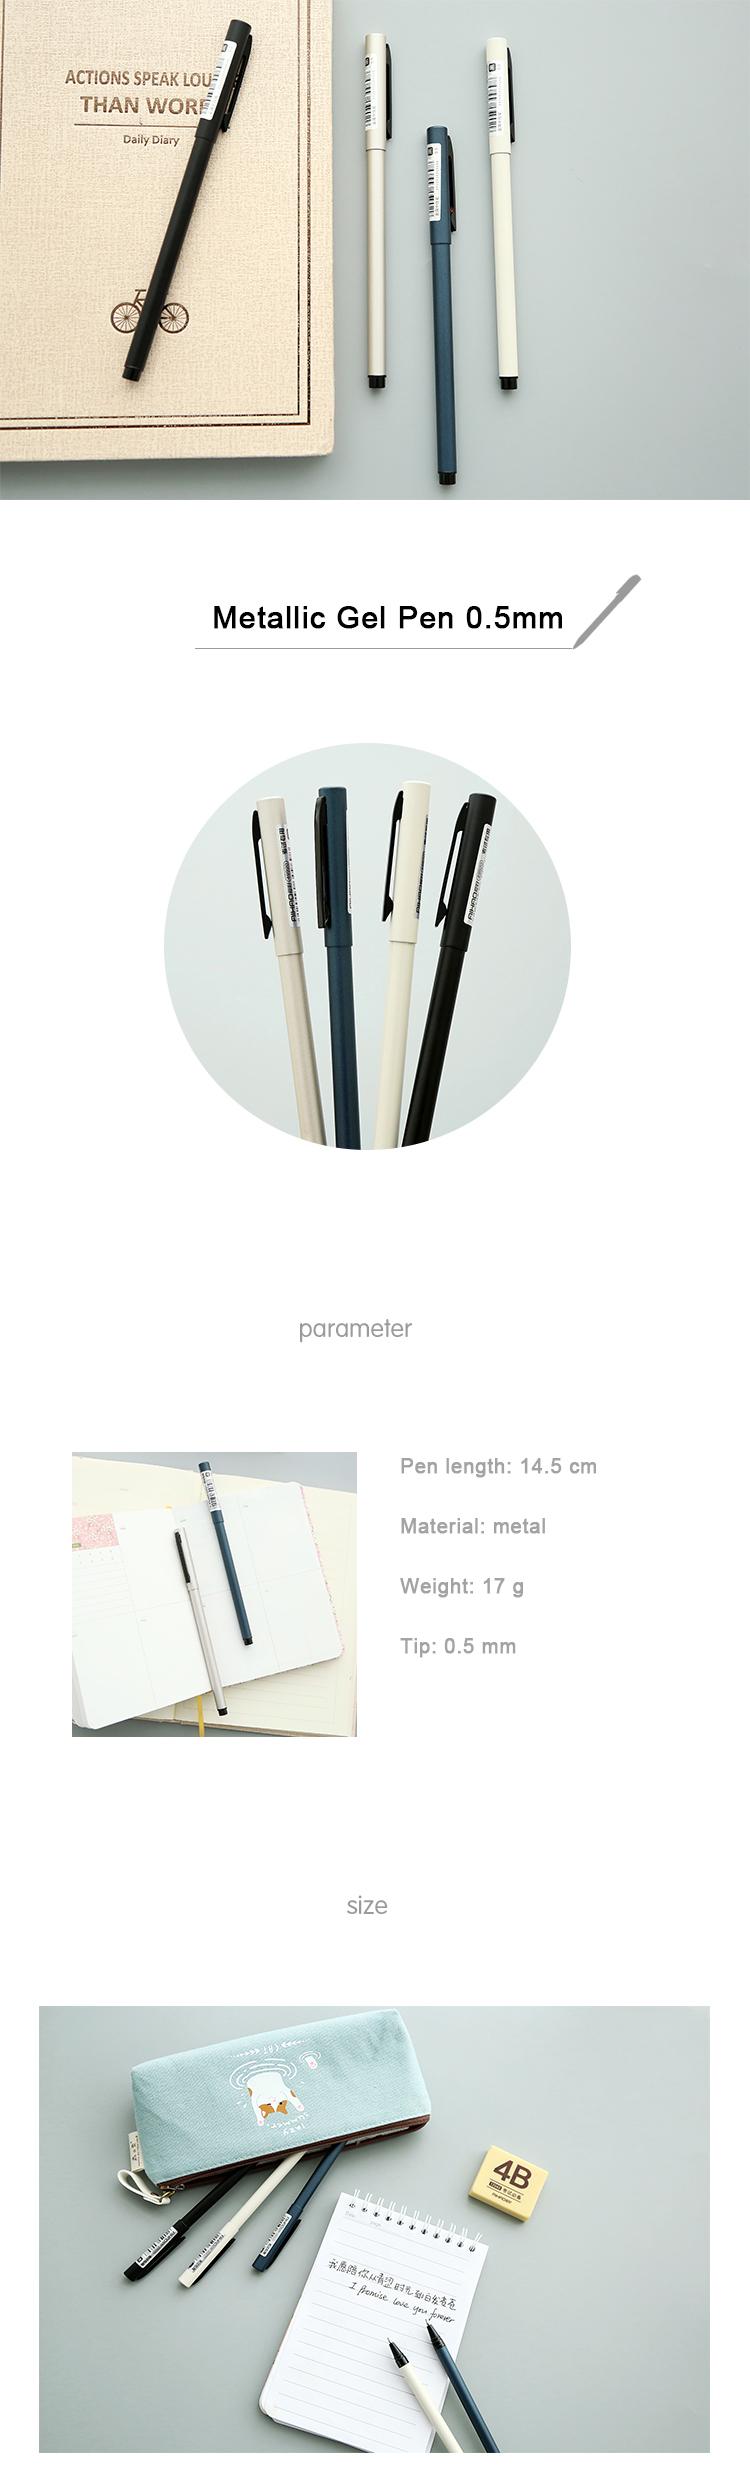 Generous 500pc Ballpoint Pen Cute Cartoon Look Creative Novelty Plush Ballpoint Pens Office Stationery Easy To Lubricate Pens, Pencils & Writing Supplies Ballpoint Pens